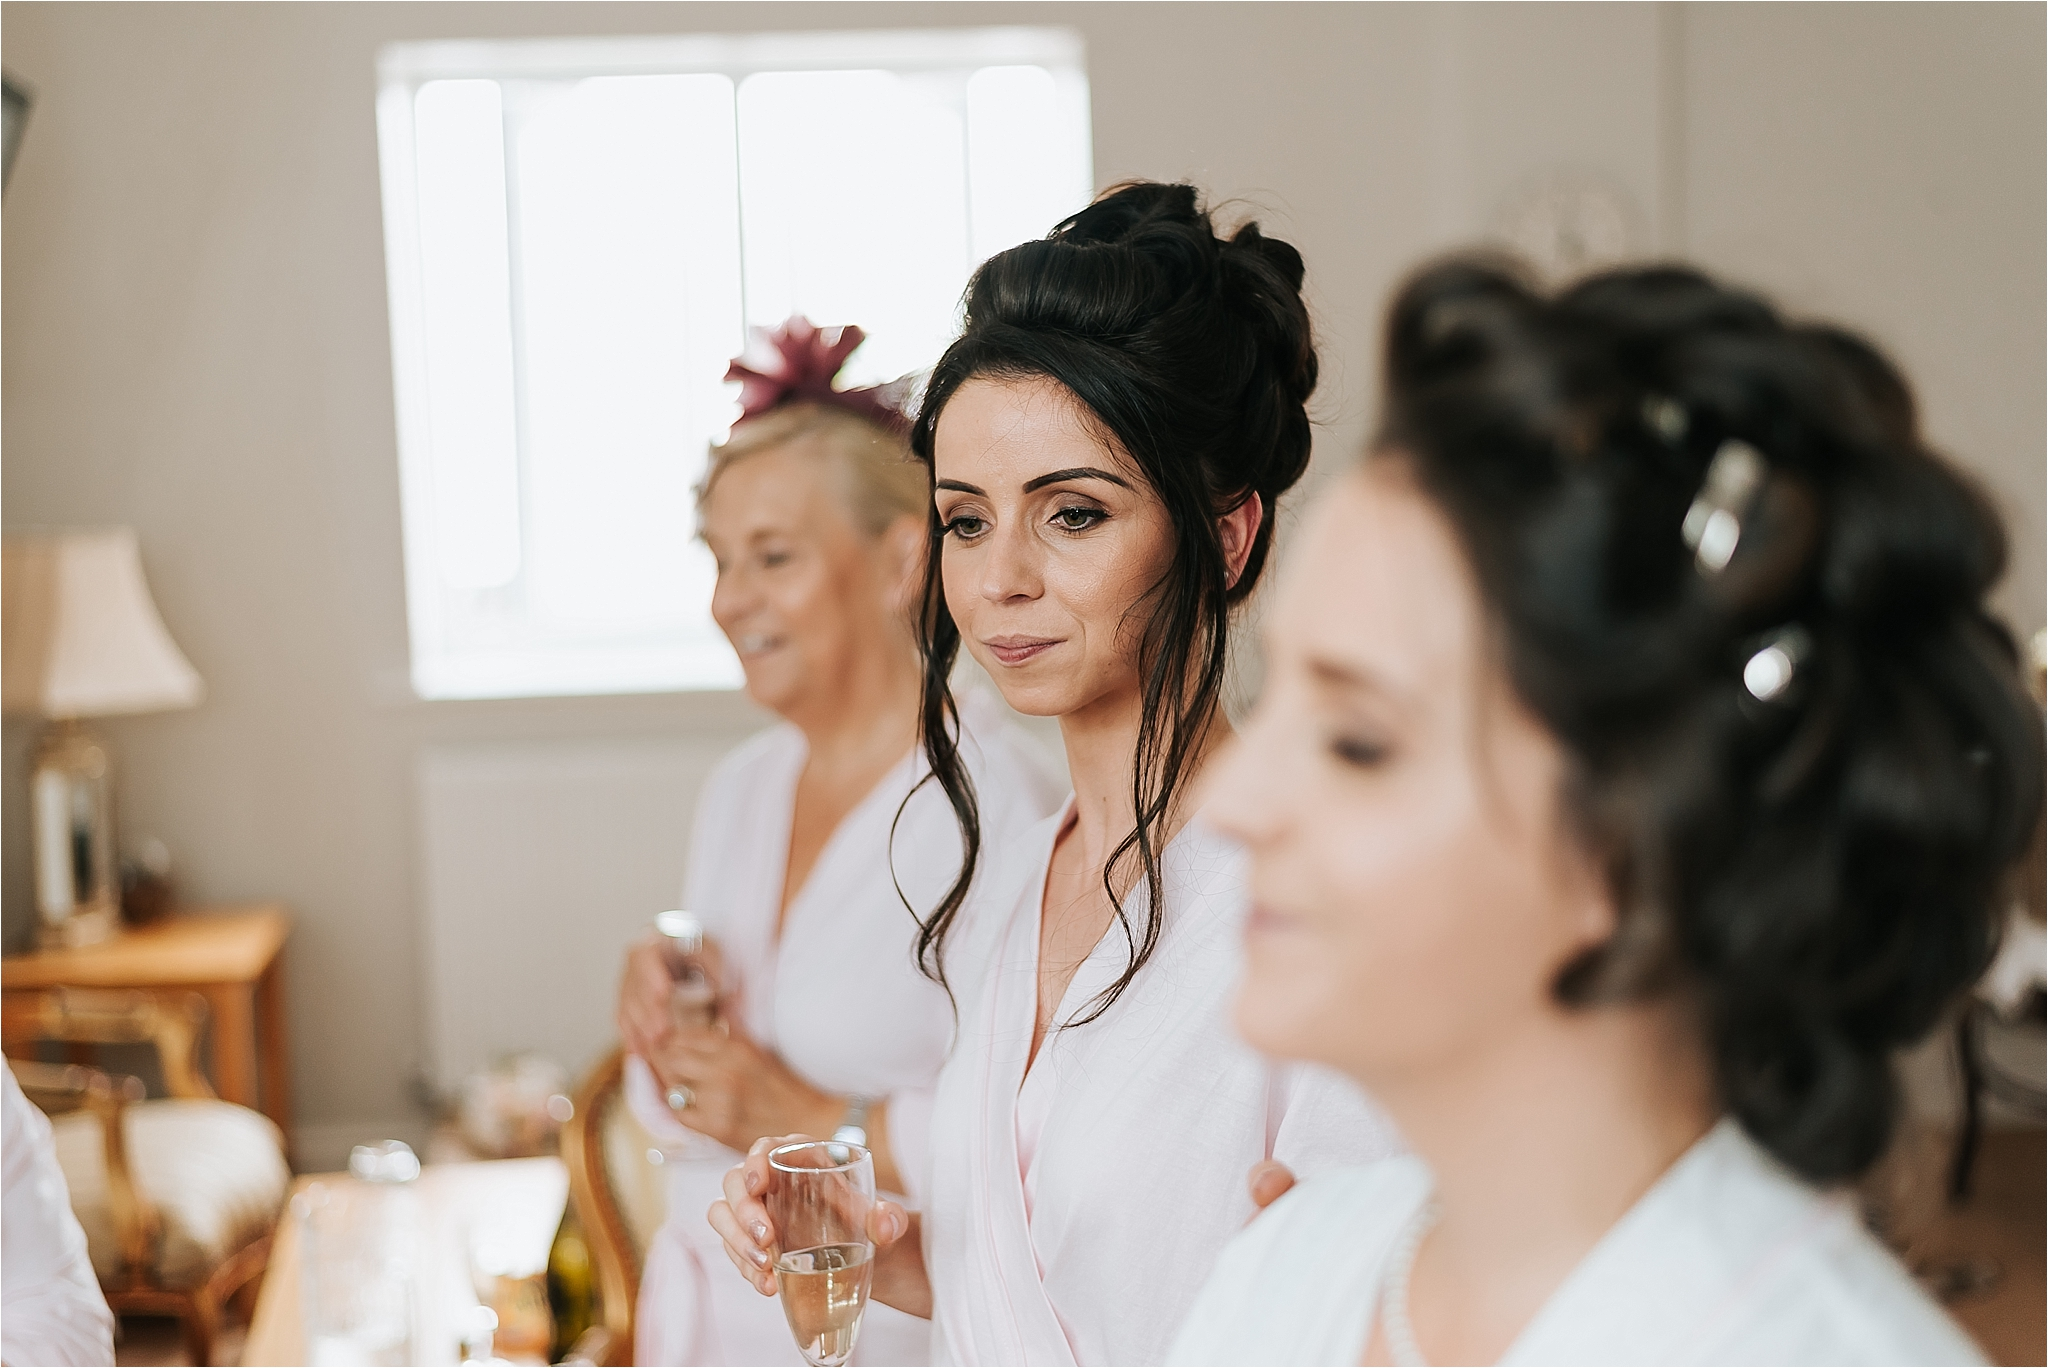 thevilla+lancashire+wreagreen+wedding+photographer9.jpg